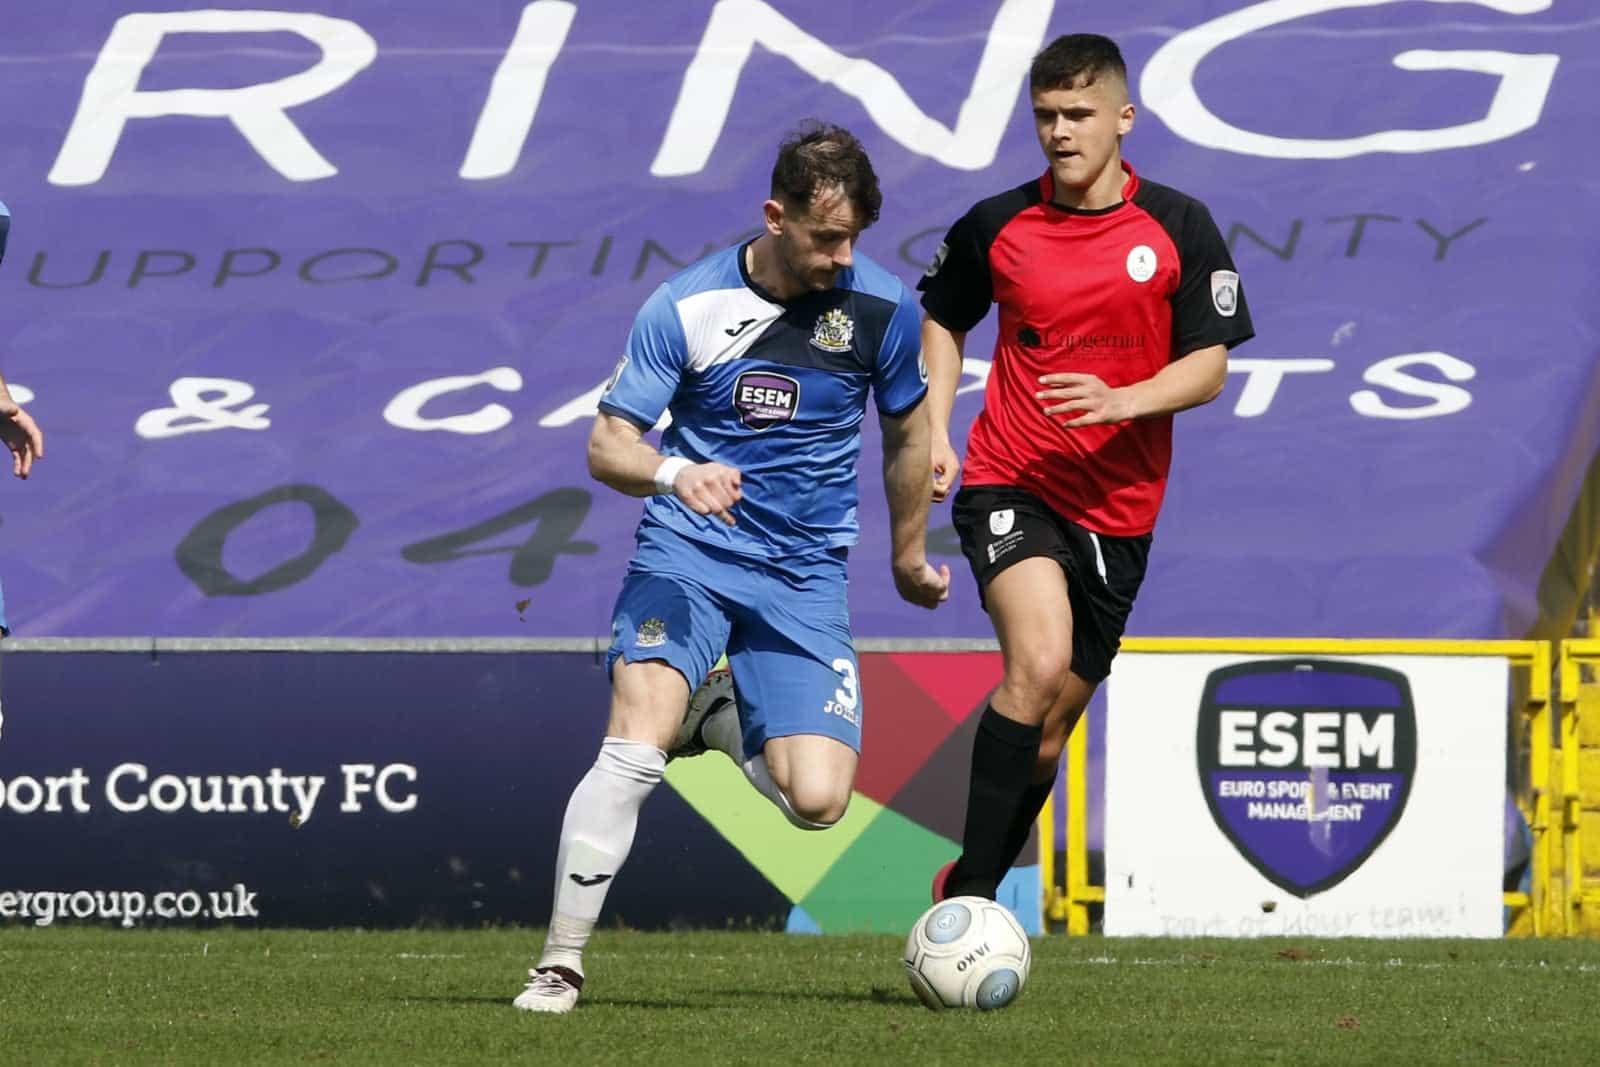 Steve O'Halloran, Stockport County 1-0 Telford, 14.4.18